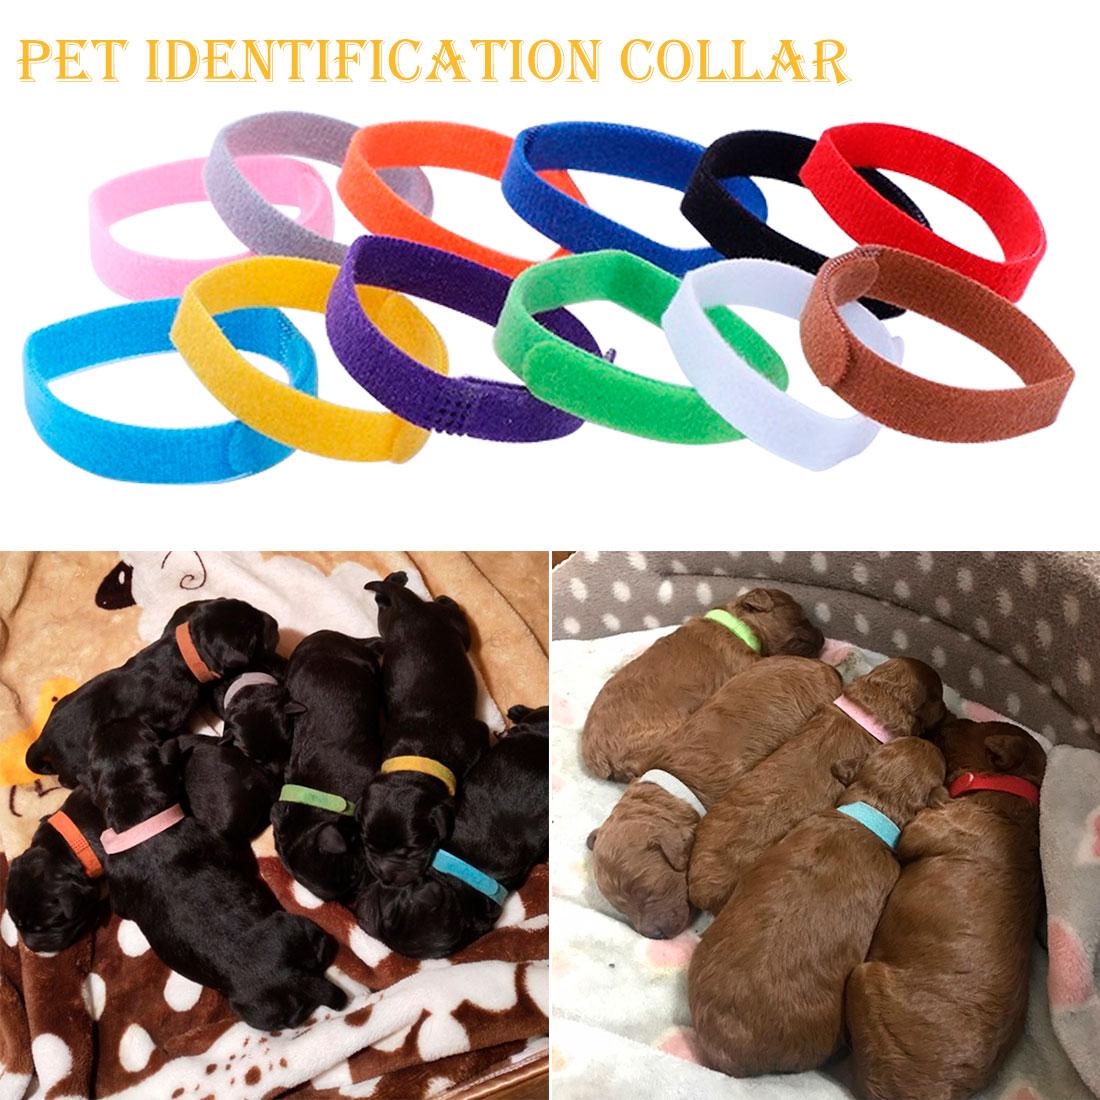 Ajustable de 12 colores de identificación ID collares bandas cachorro perro gato mascota gato de terciopelo práctica suministros para Mascotas y Cachorros